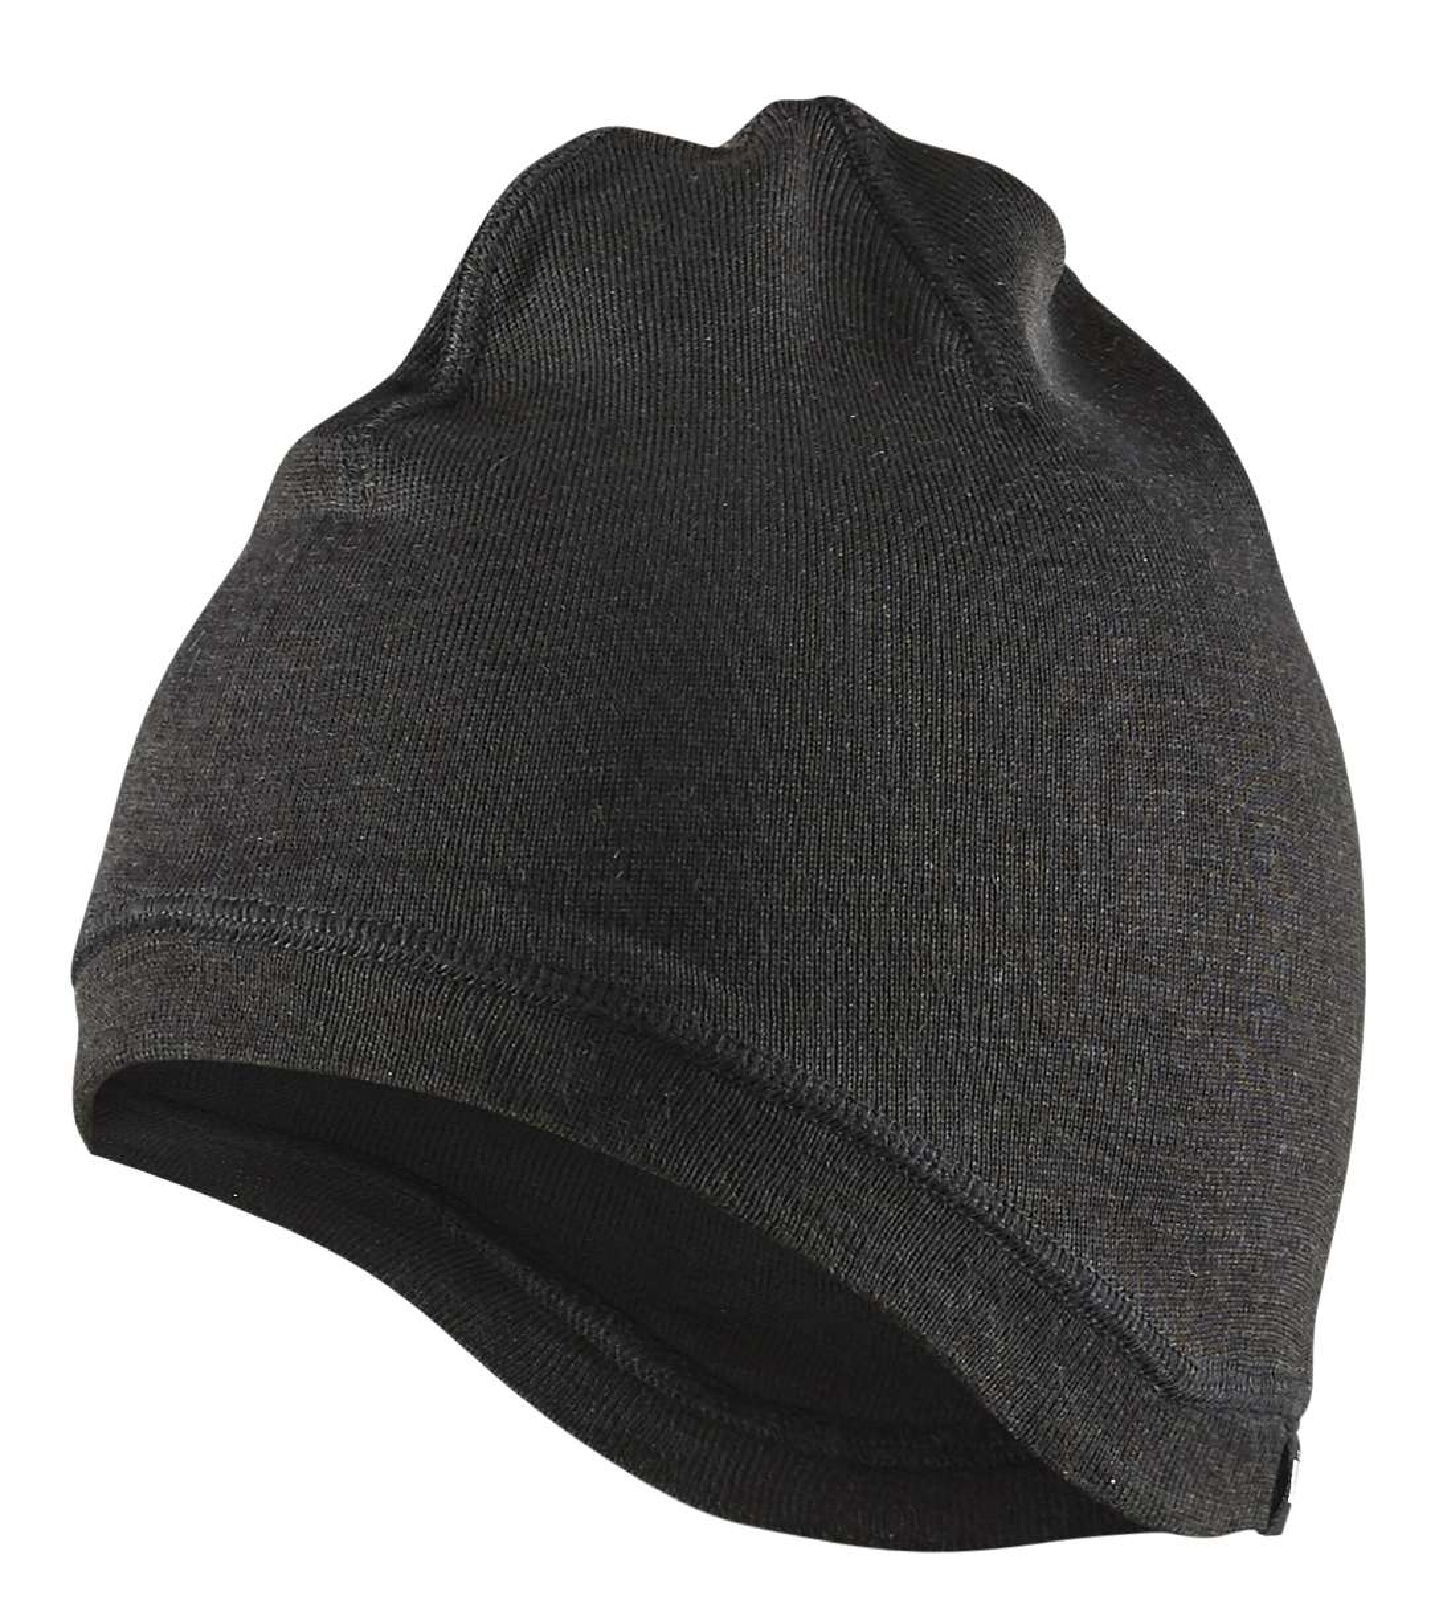 Blaklader Mutsen 20044003 Bouwhelm voering zwart(9900)